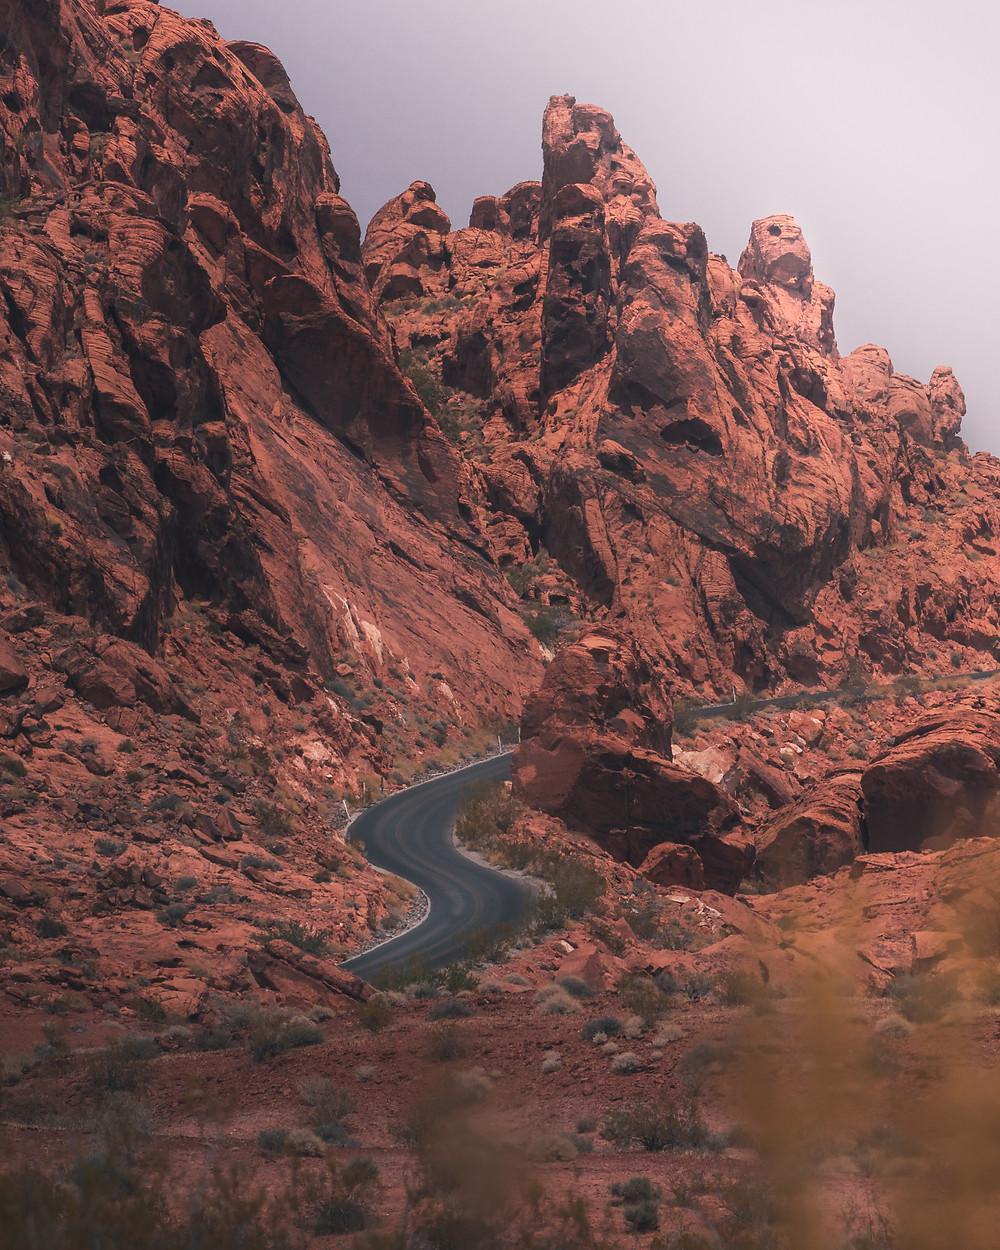 curvy roads through rocky mountains